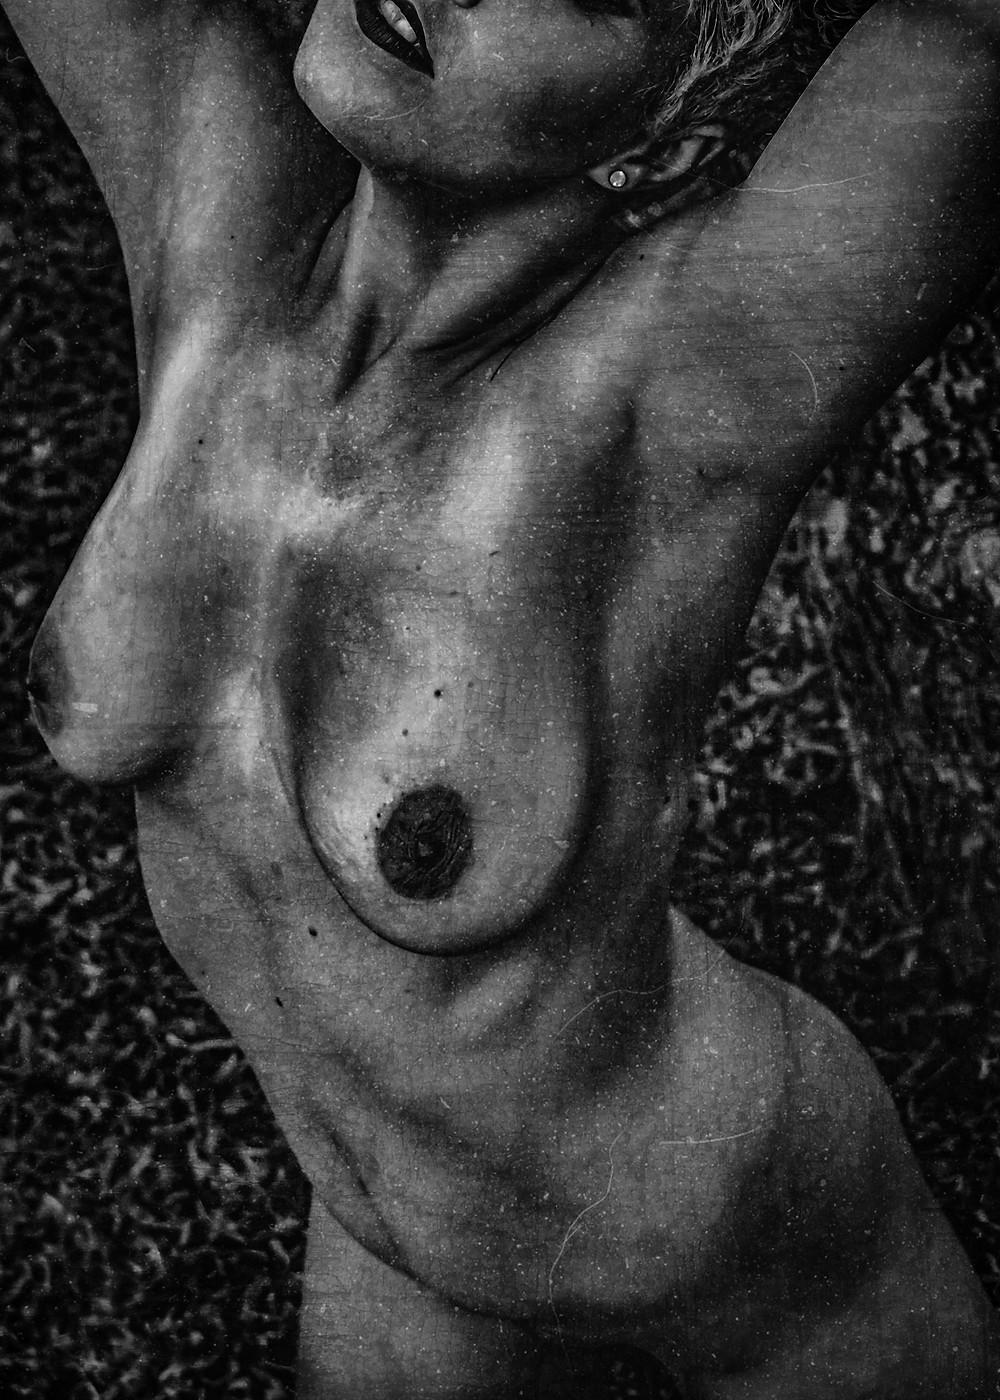 felipe hueb photography fotografia em nu artistico nudez fotografia arte fotografo